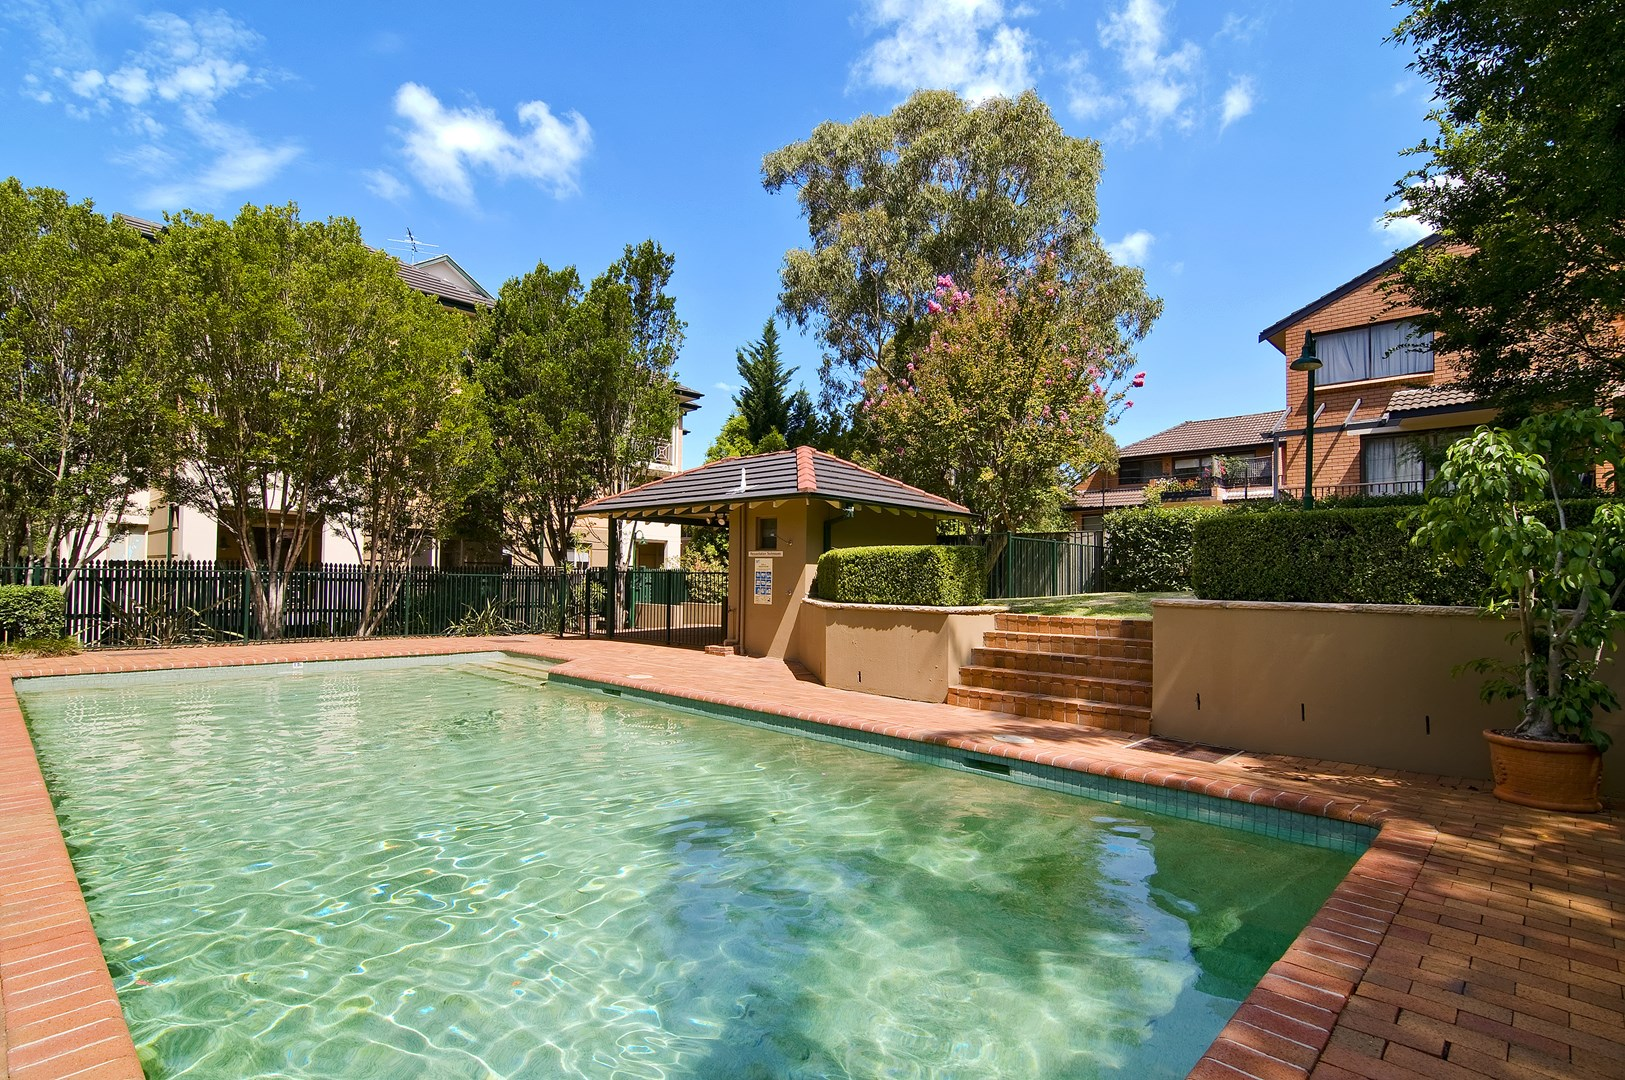 46/40-44 Rosalind Street, Cammeray NSW 2062, Image 0